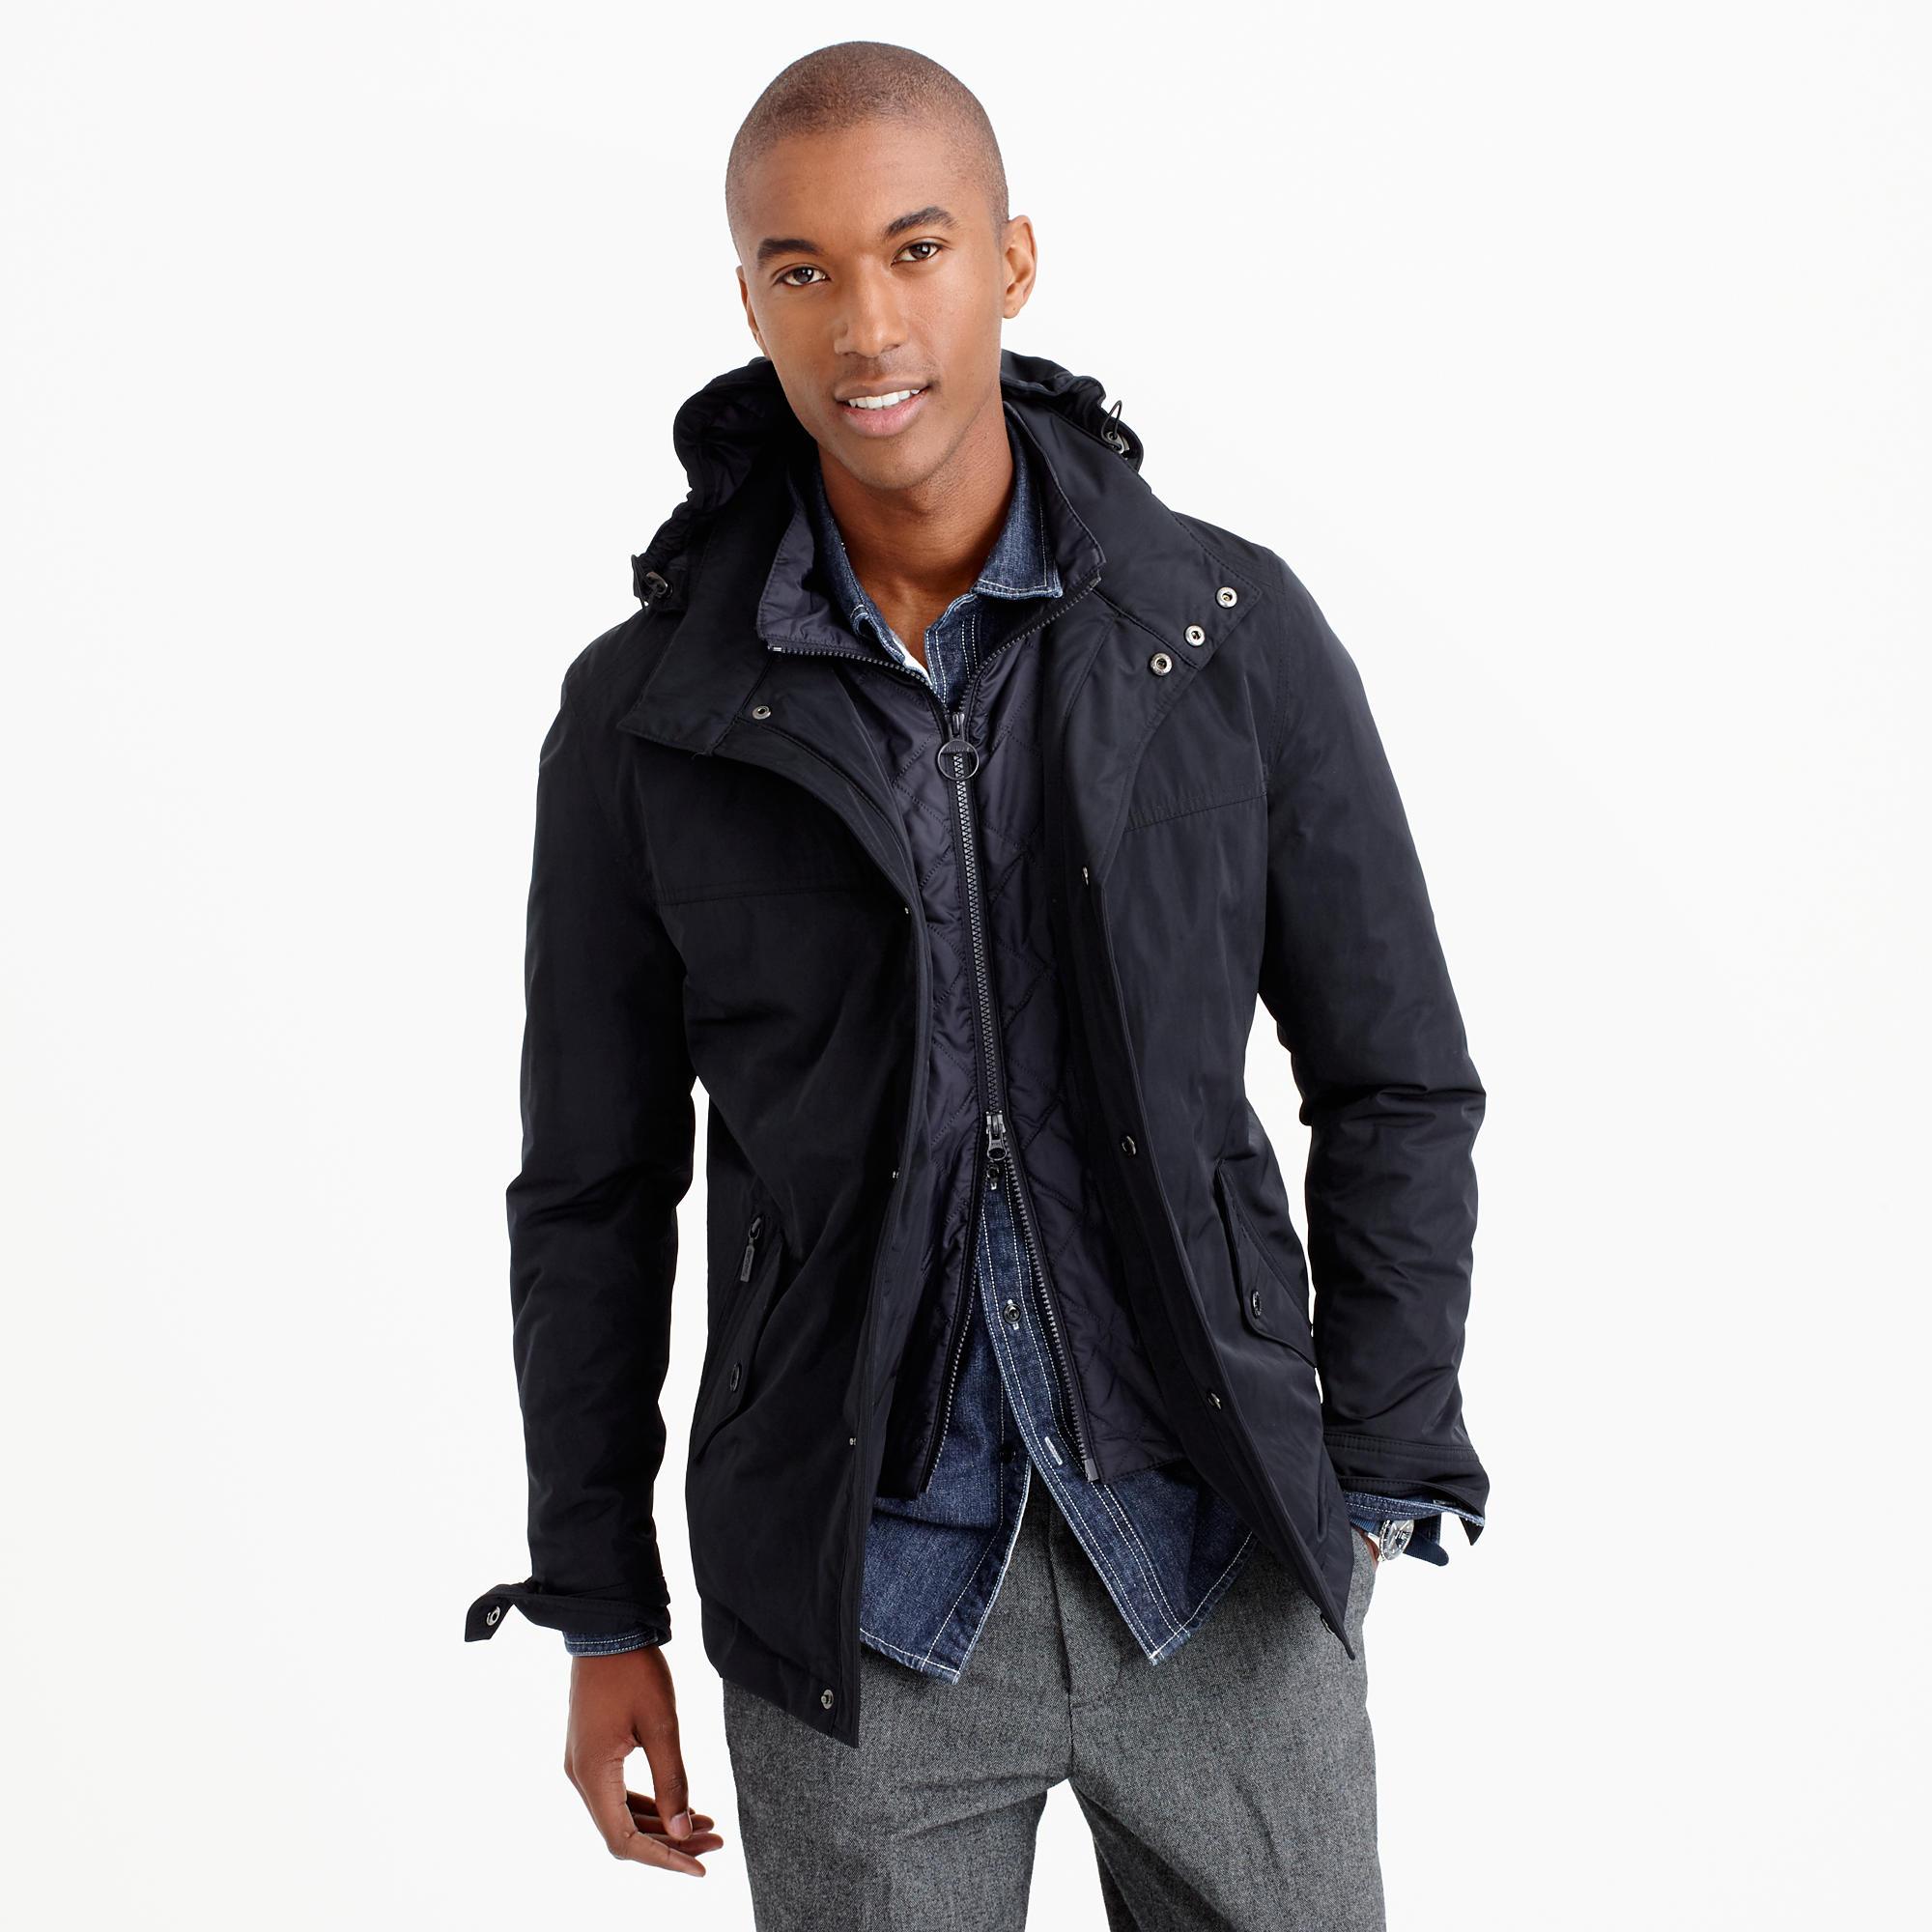 Mens jacket barbour - Barbour Reg Tulloch